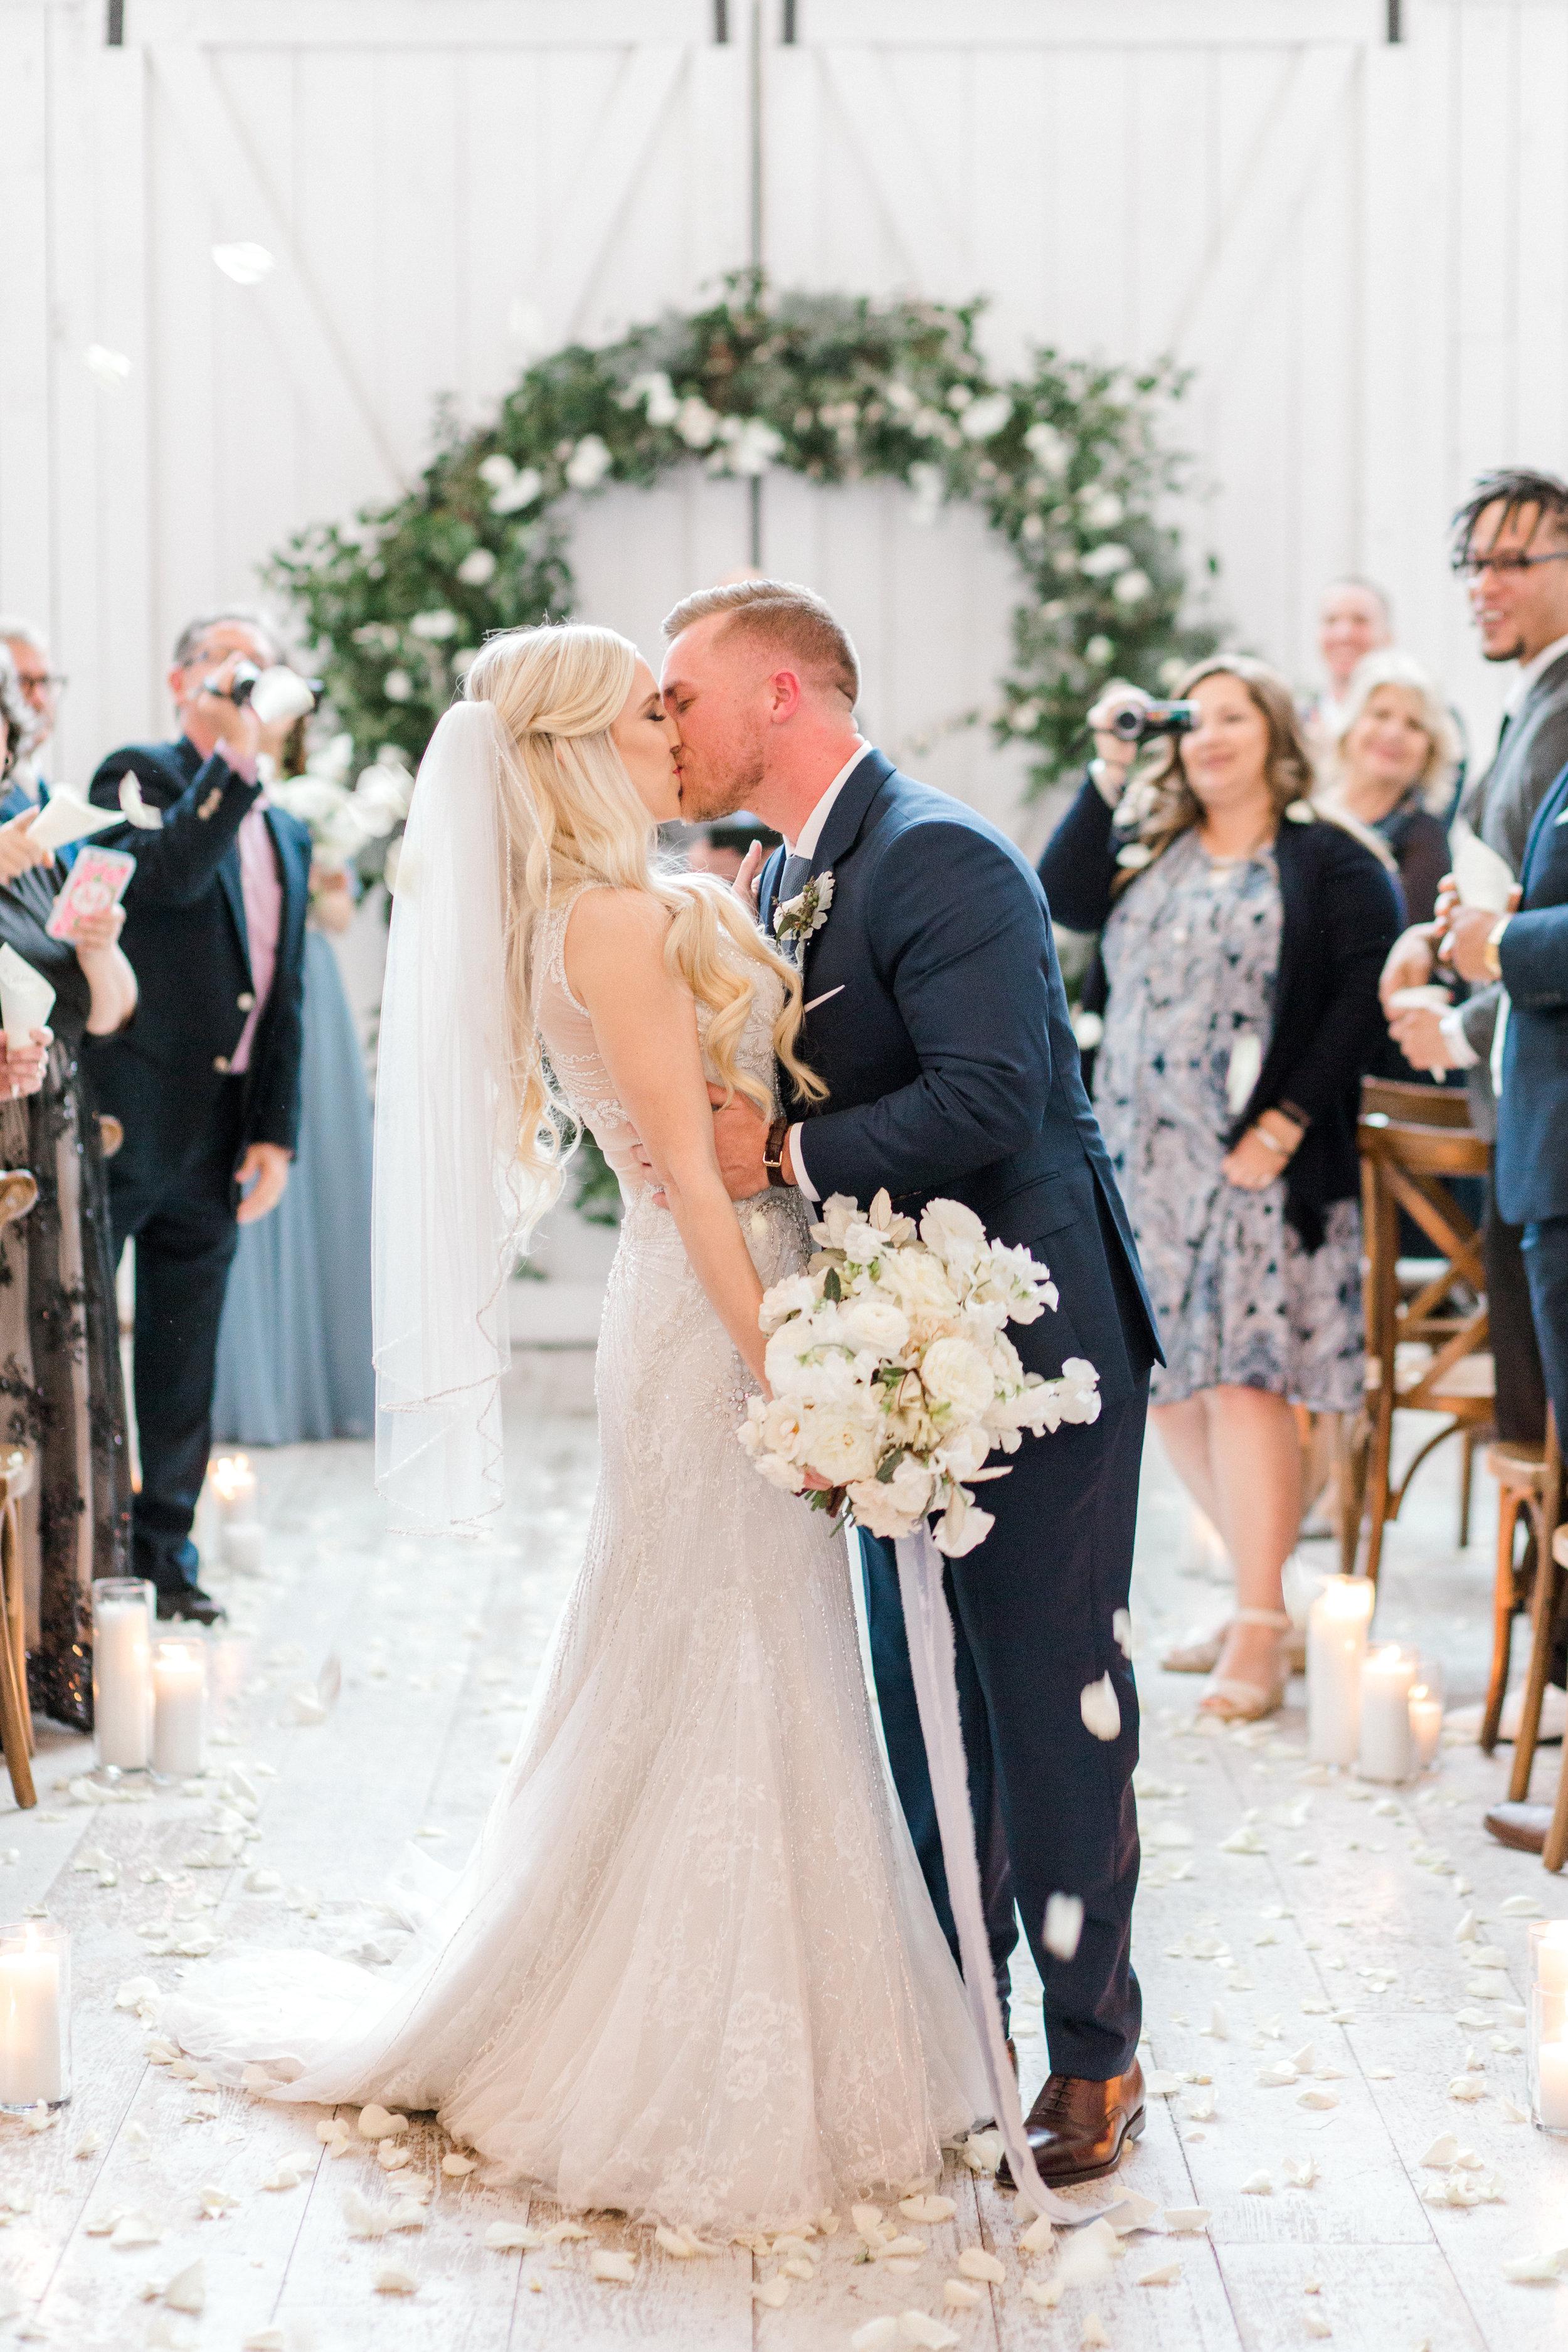 Chloe+Austin Wedding_424.JPG